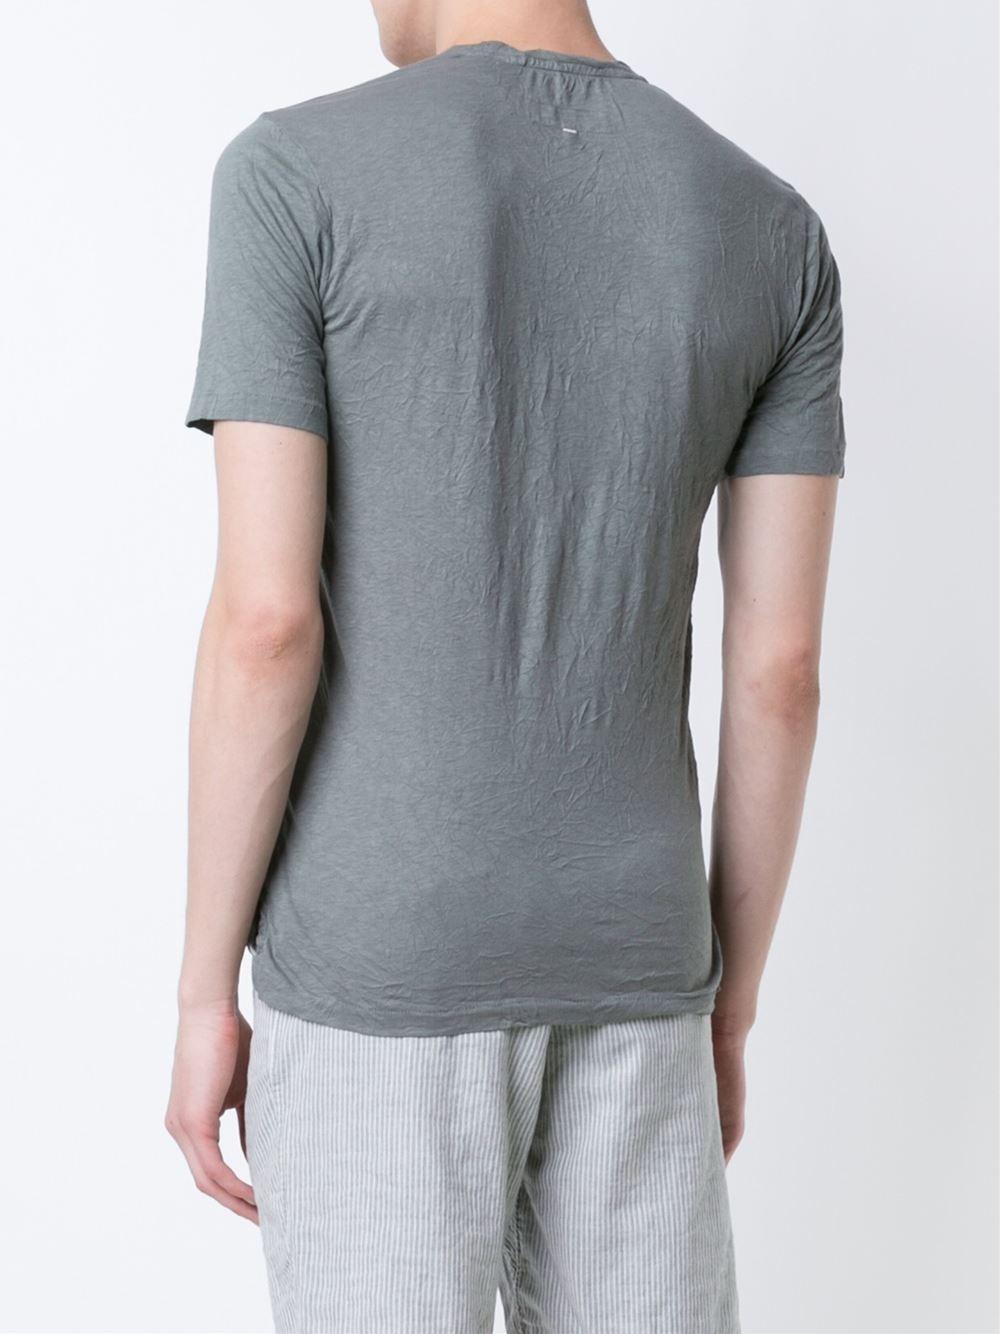 Rag bone crinkled t shirt in gray for men lyst for Rag and bone t shirts